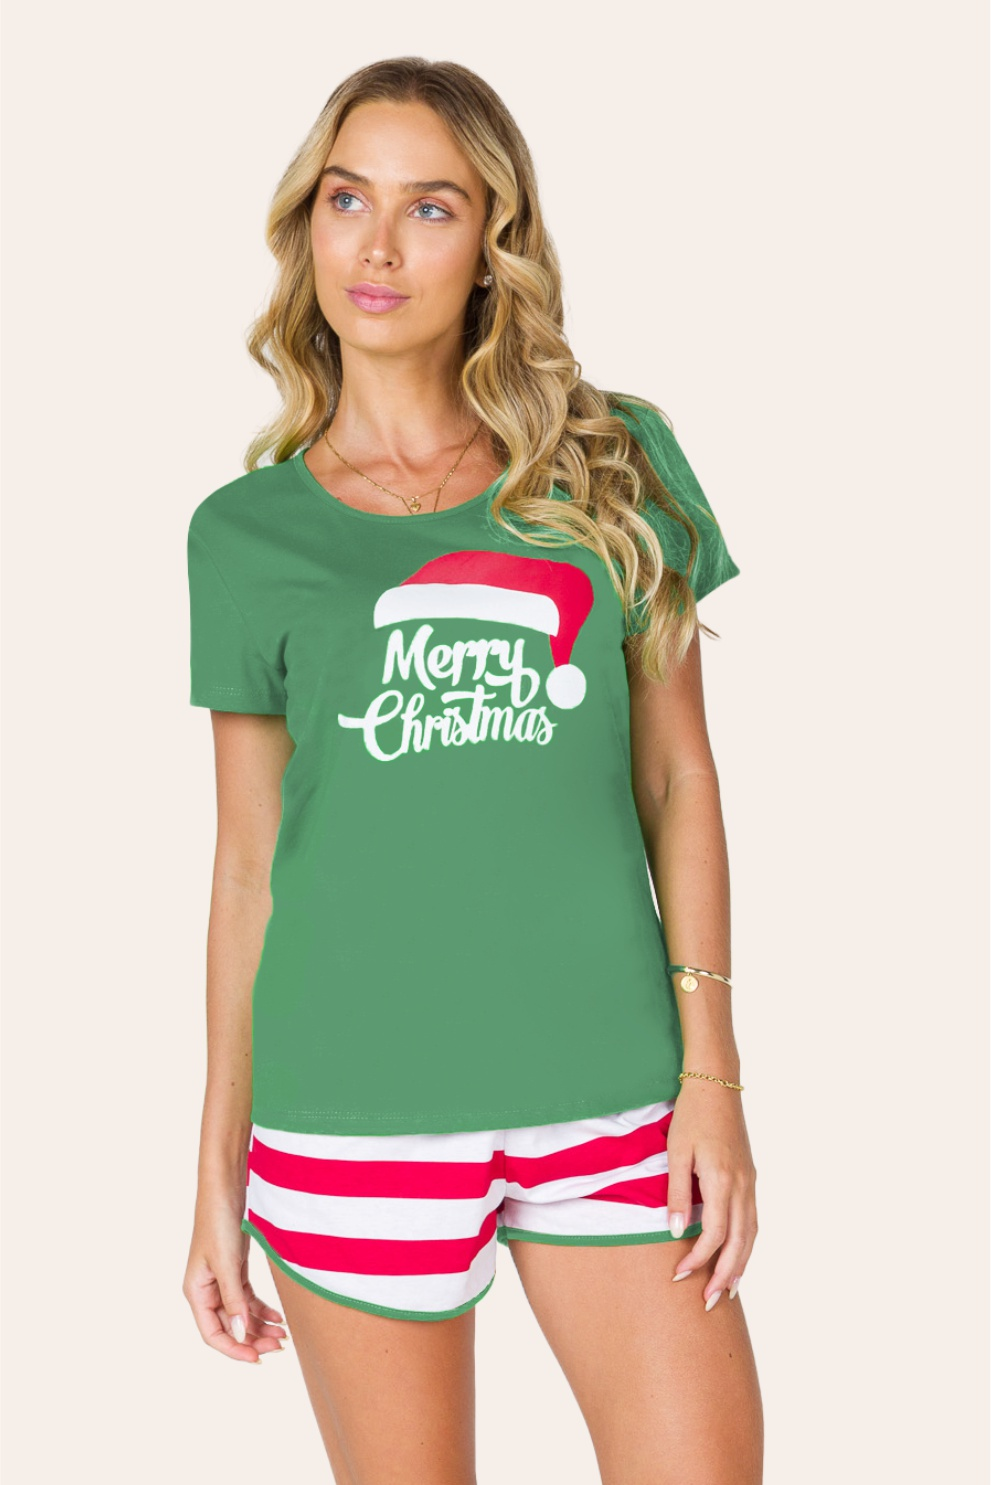 047/A - Pijama de Natal Para Família Merry Christmas - Adulto Feminino